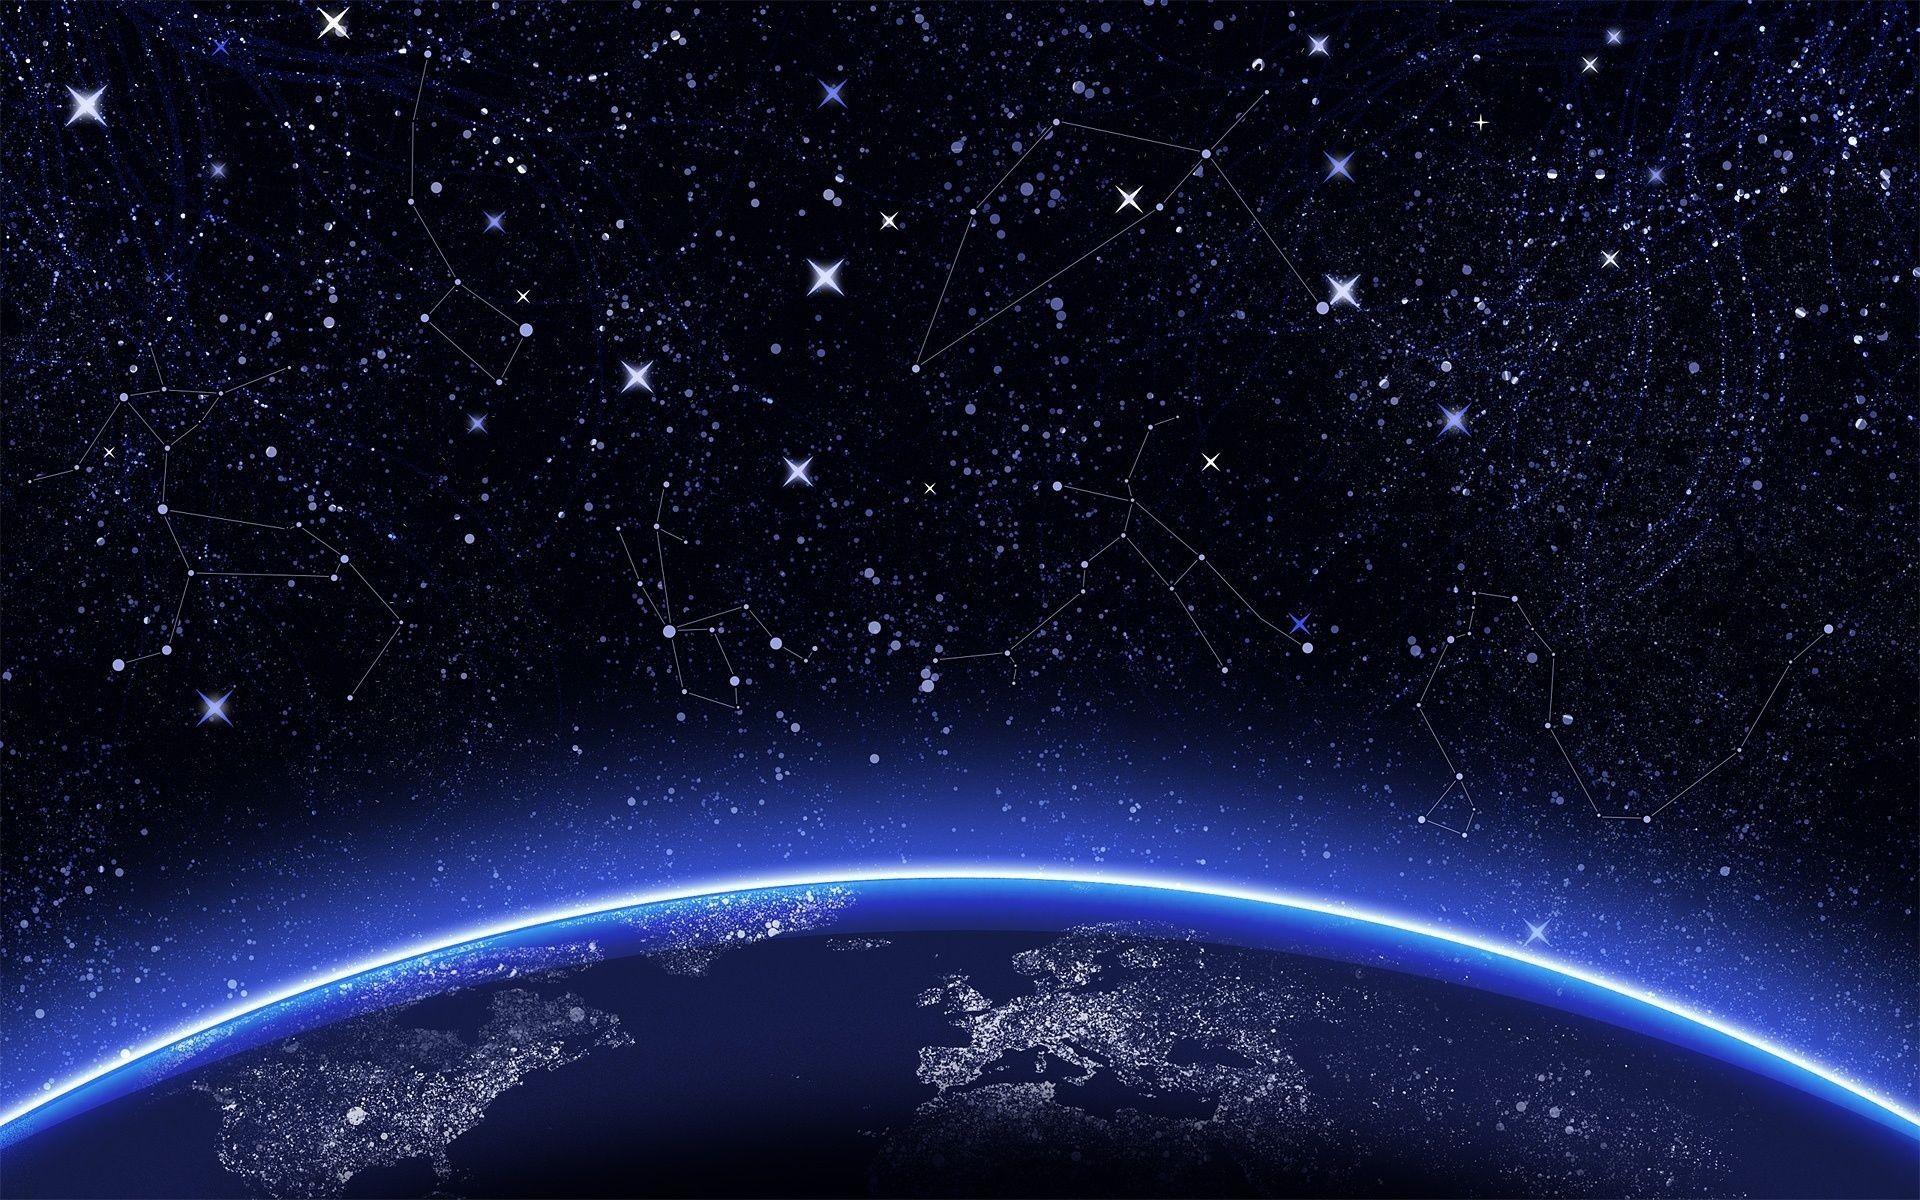 Amazing Wallpaper Night Galaxy - 344155-night-wallpaper-1920x1200-samsung-galaxy  Trends-72162.jpg